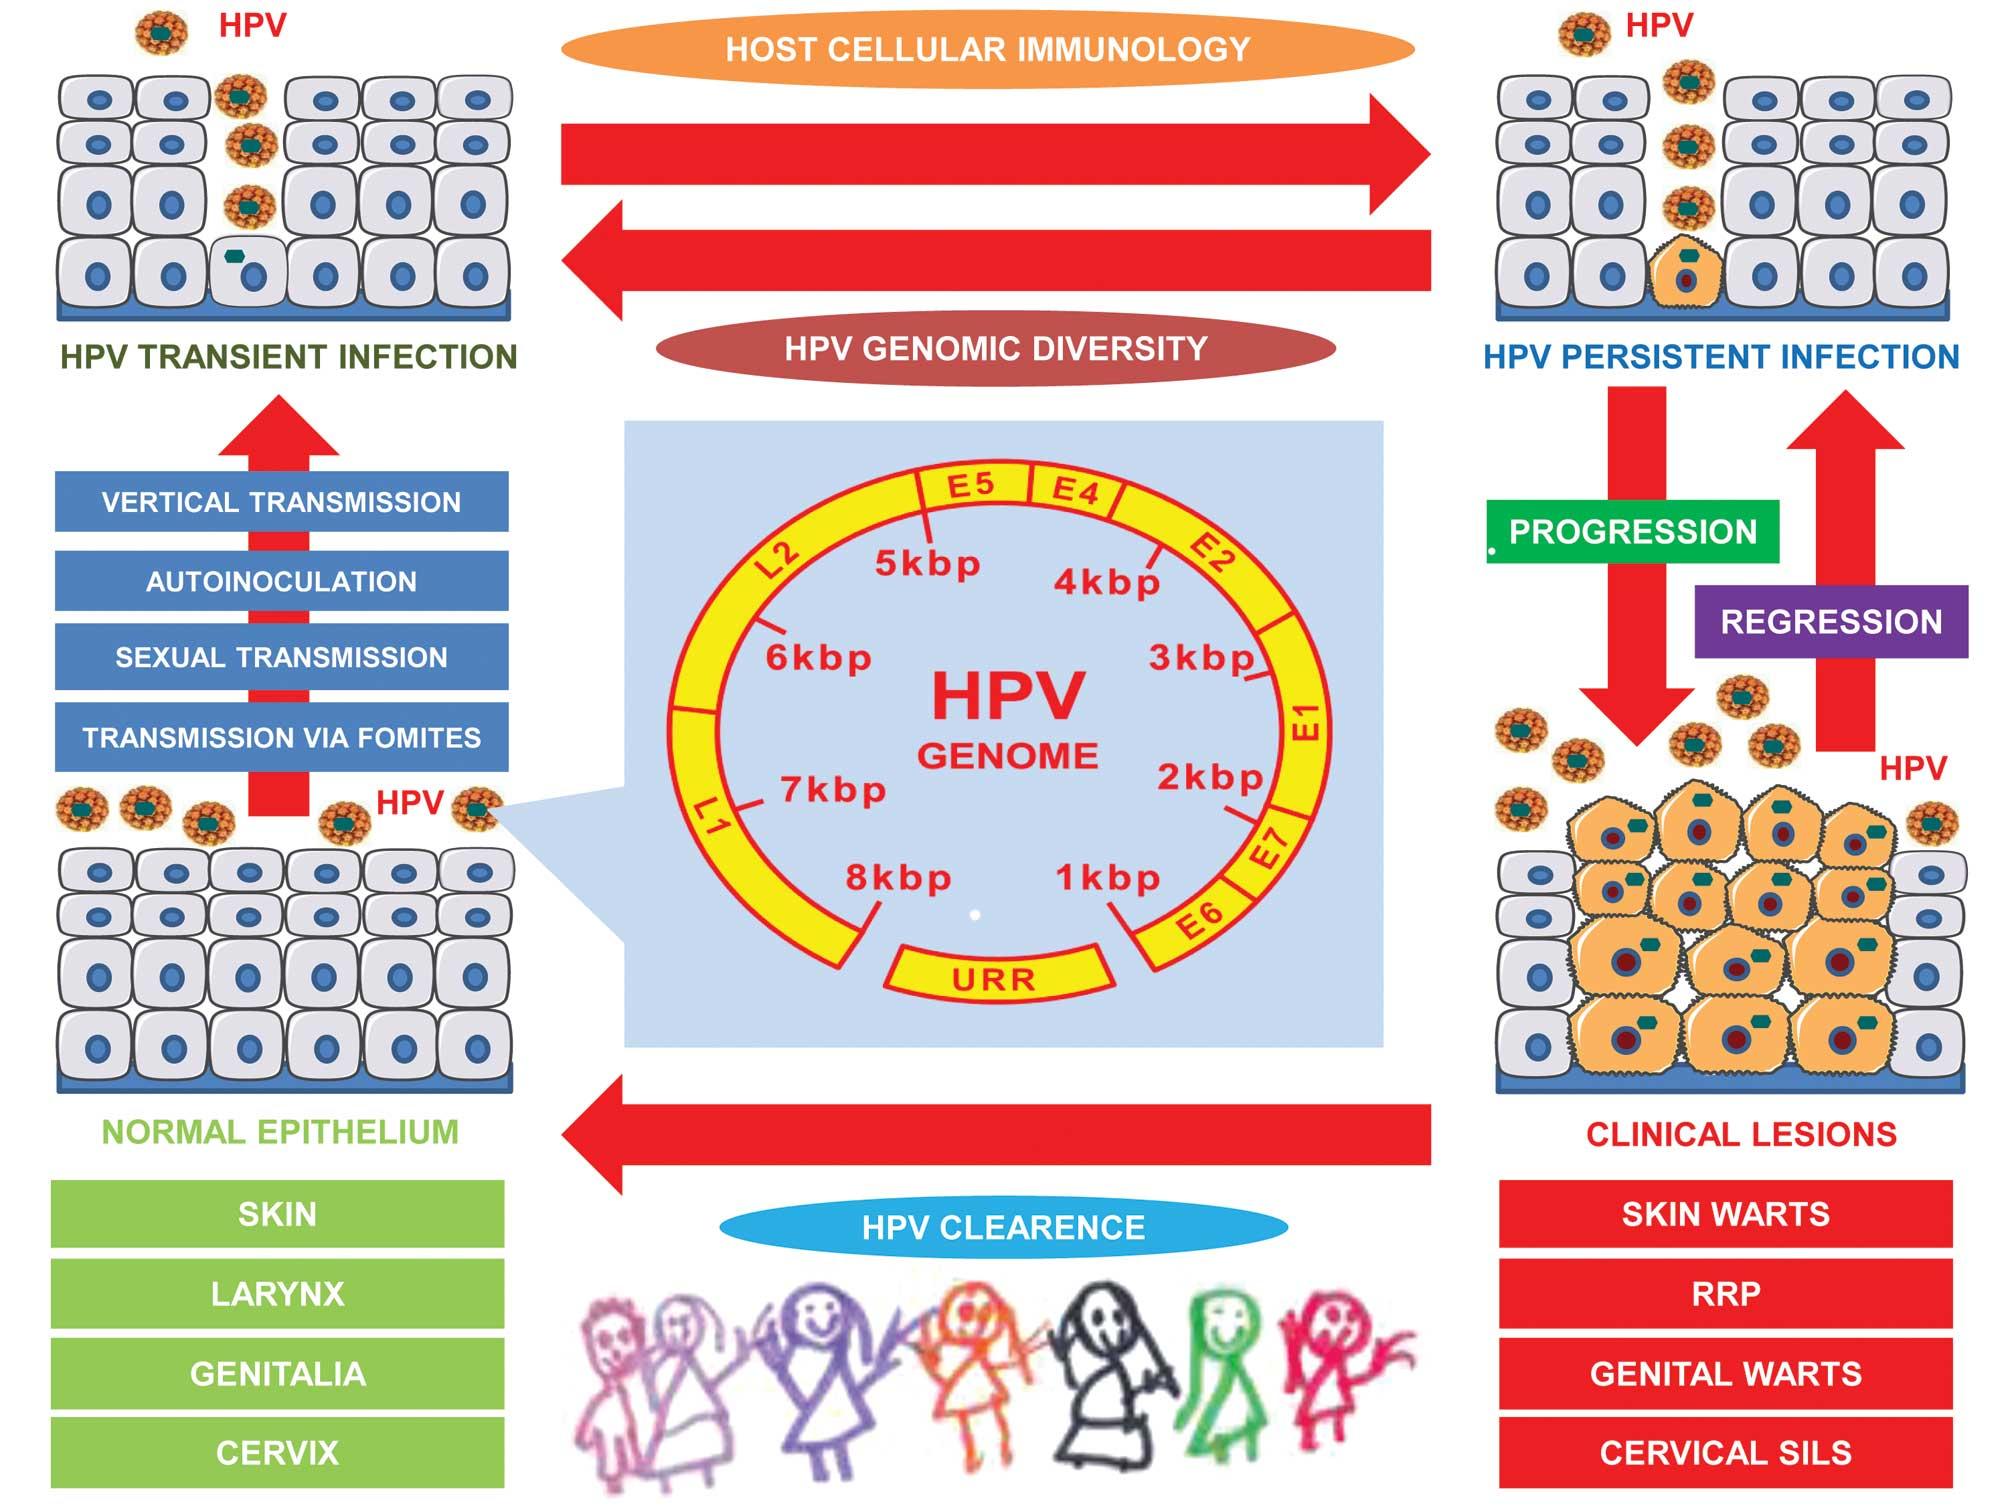 Viața cu HPV - Medicis